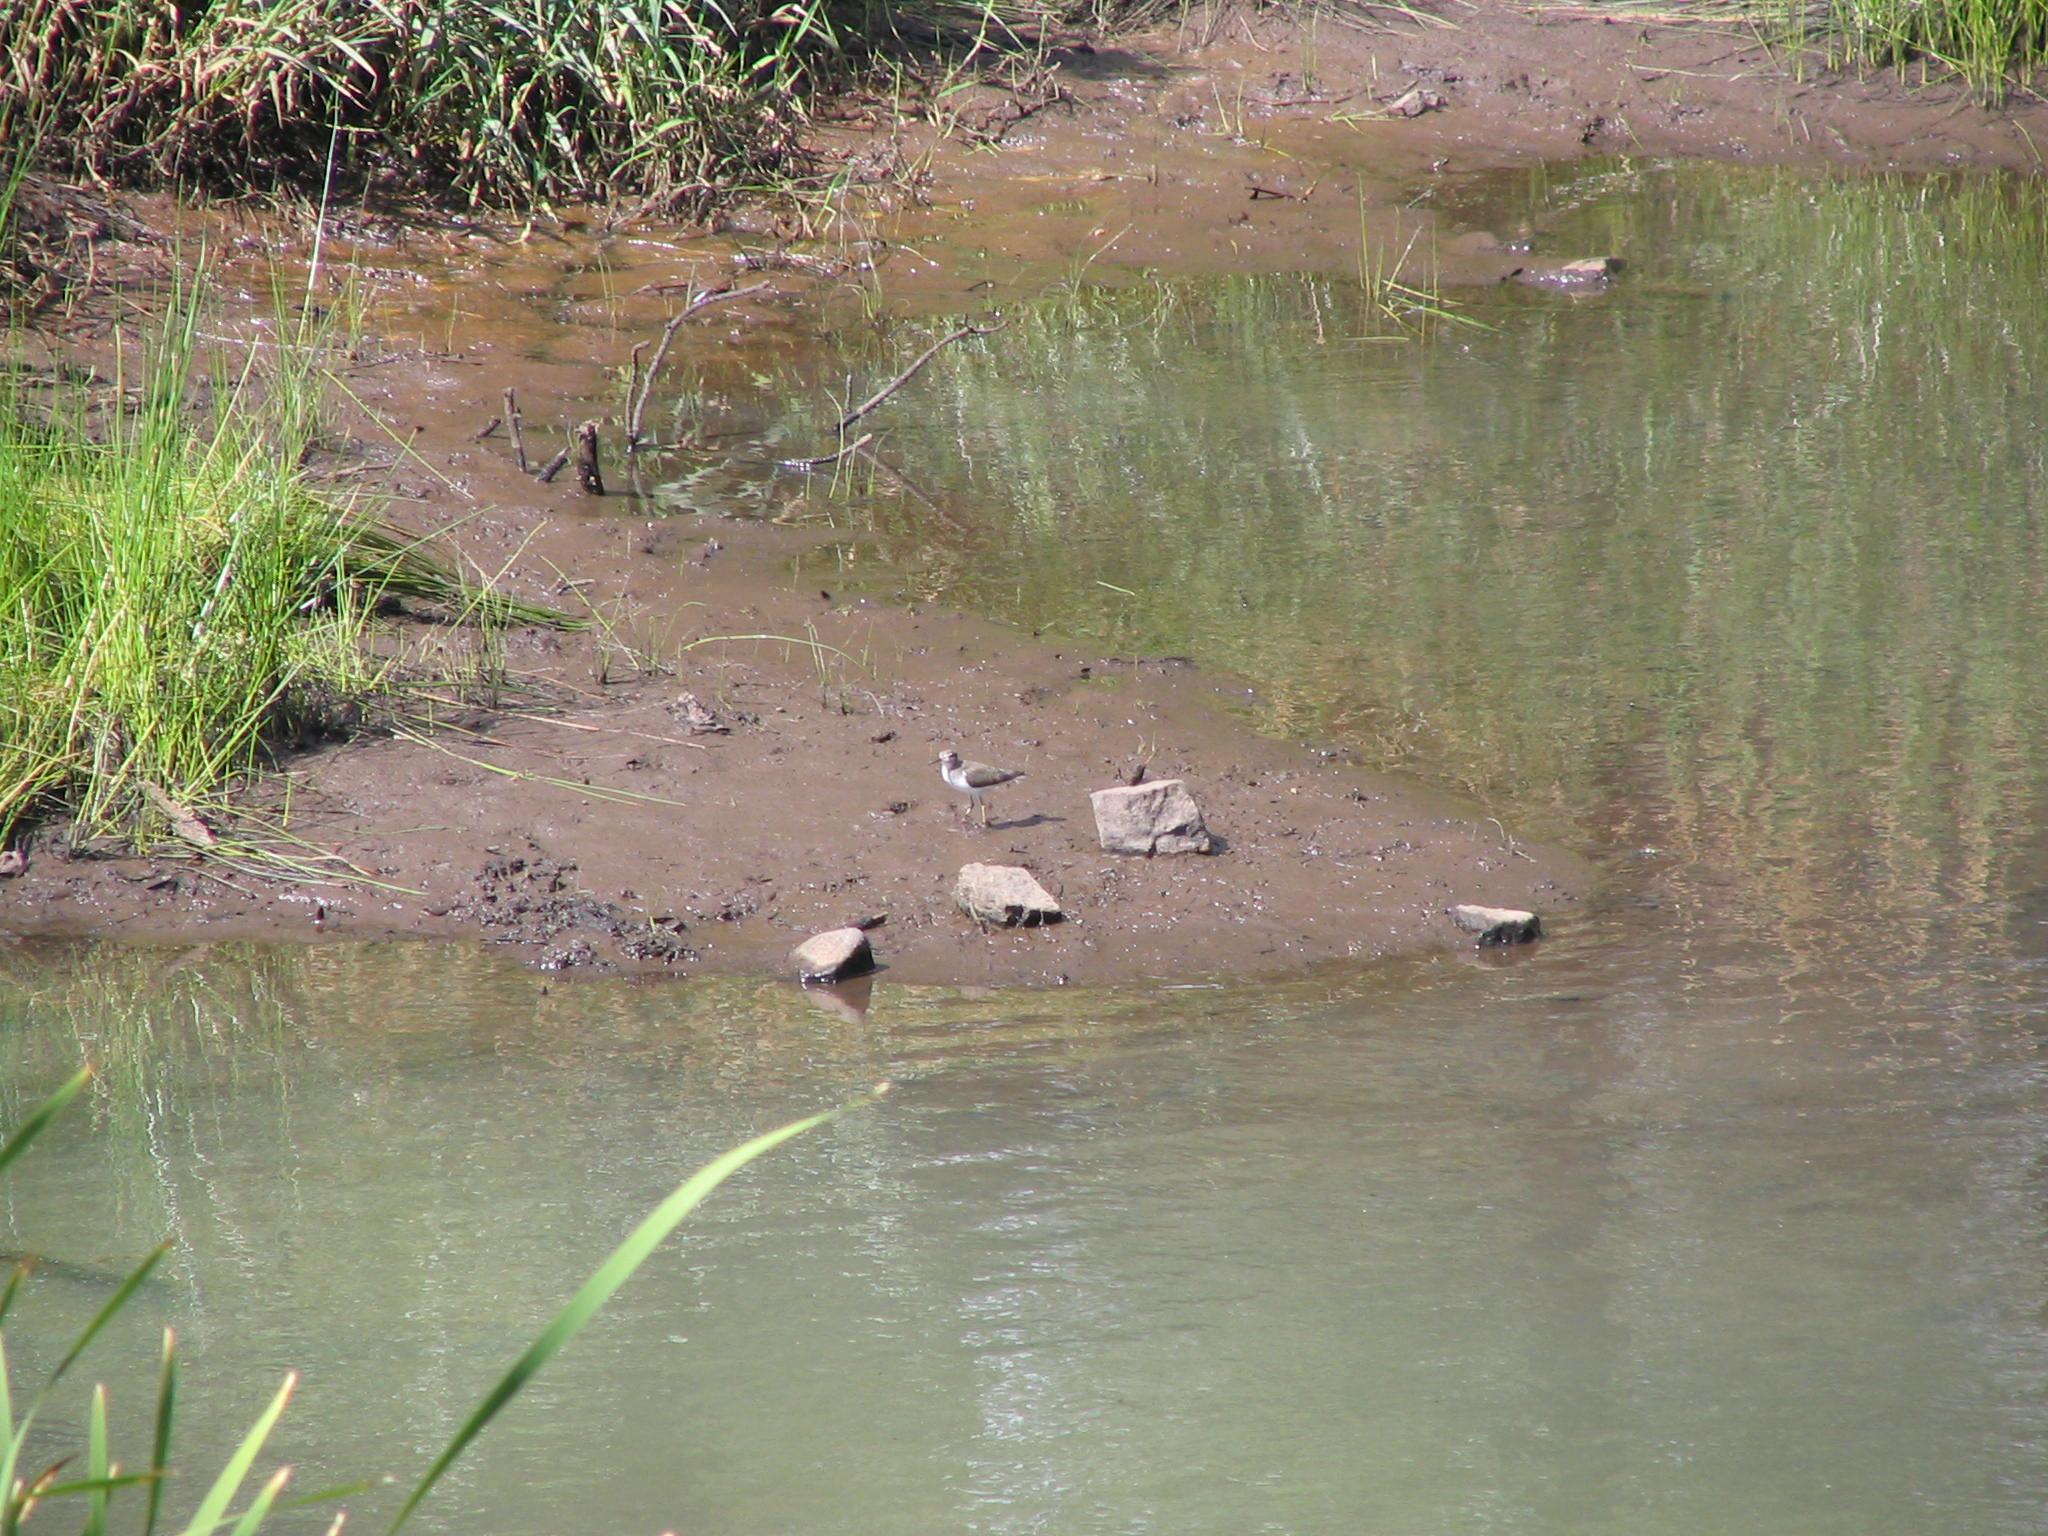 Bird at Pond